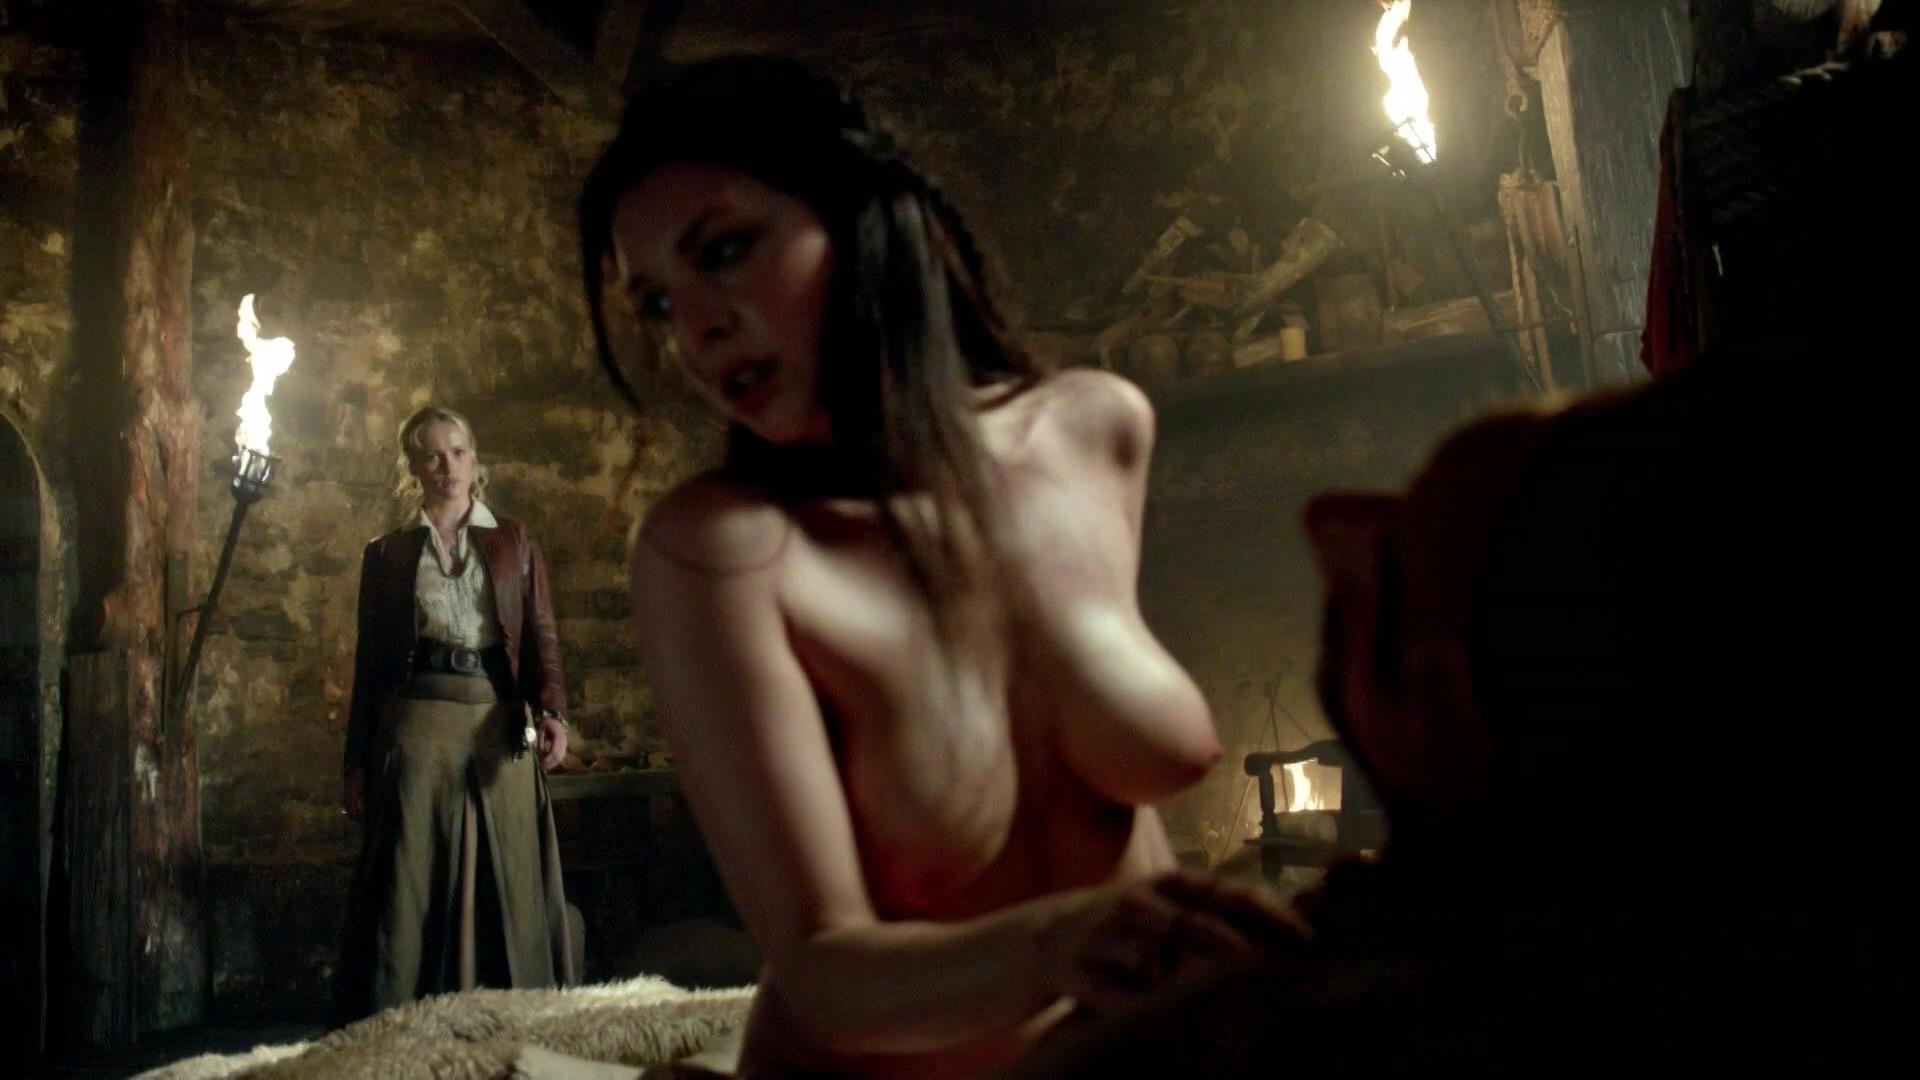 Congratulate, Paget brewster fotos desnuda